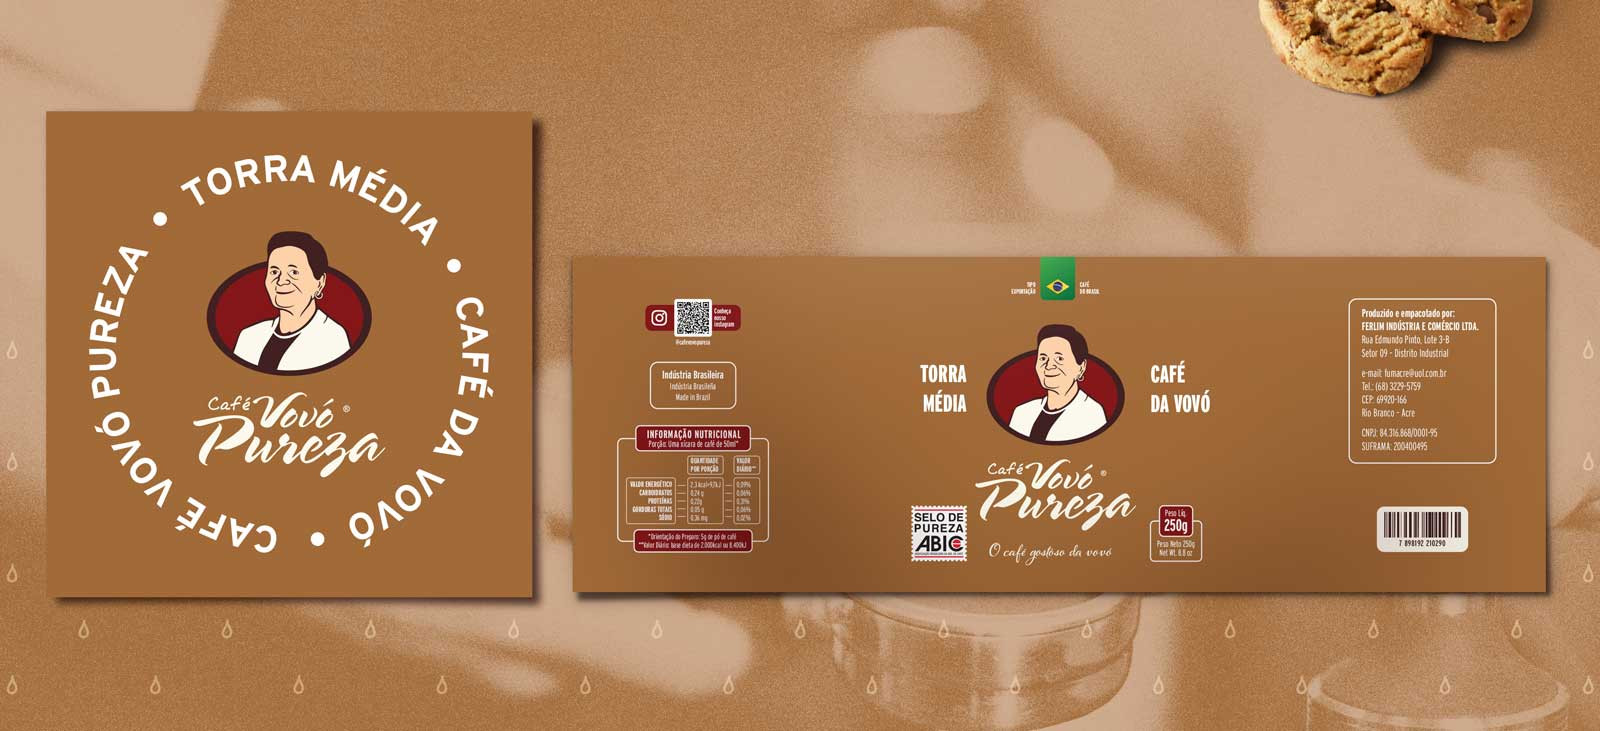 cafe-vovo-pureza-pote-mkp-3.jpg